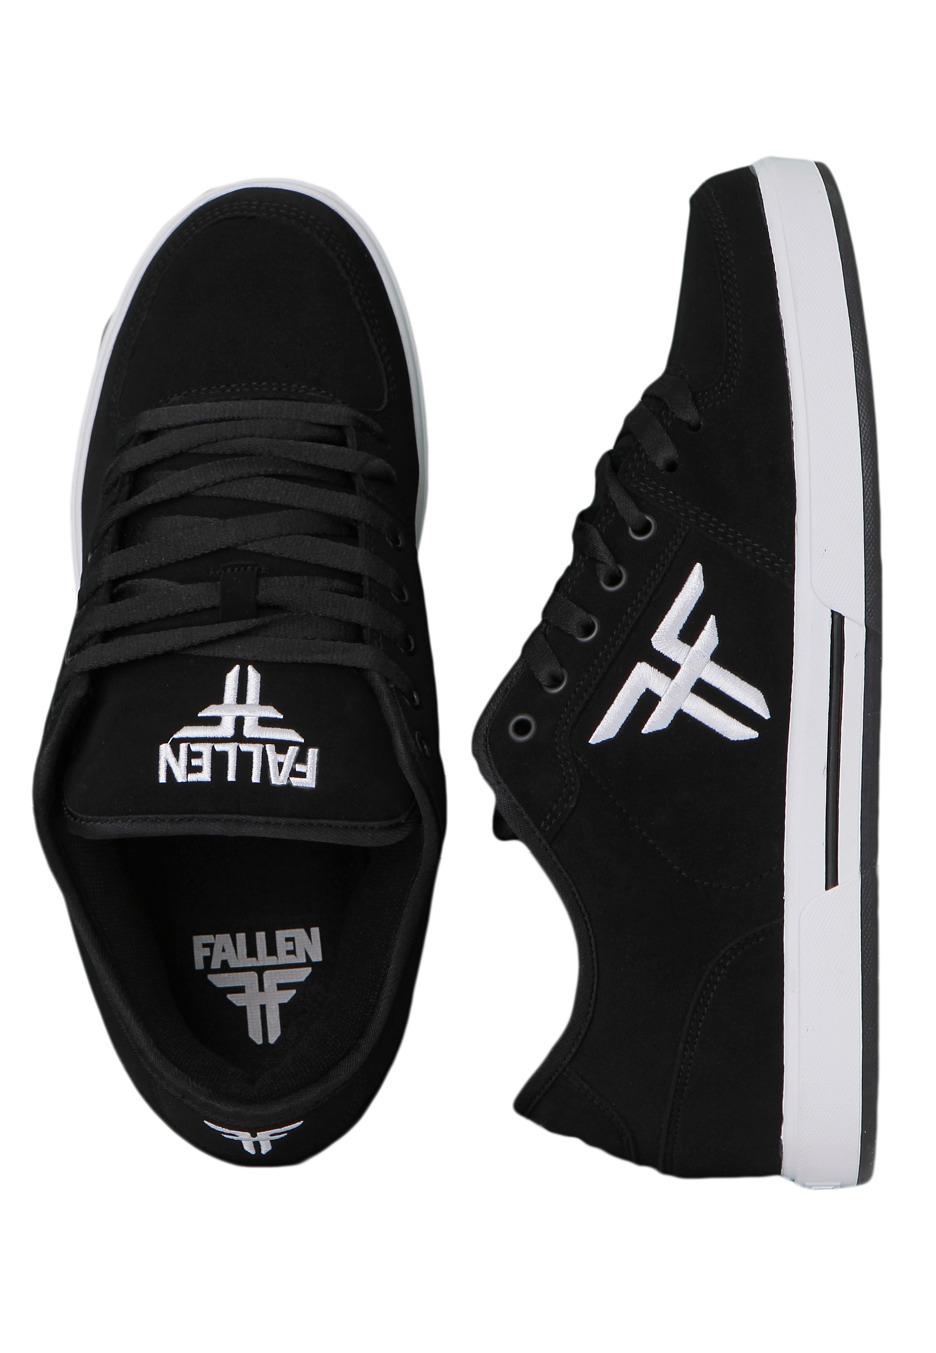 Fallen Skate Shoes Size